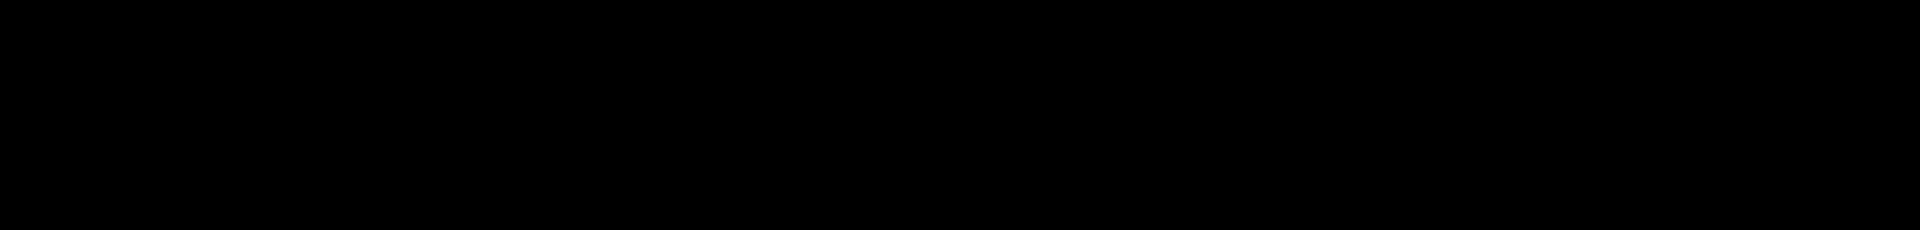 Rectangle-Noir